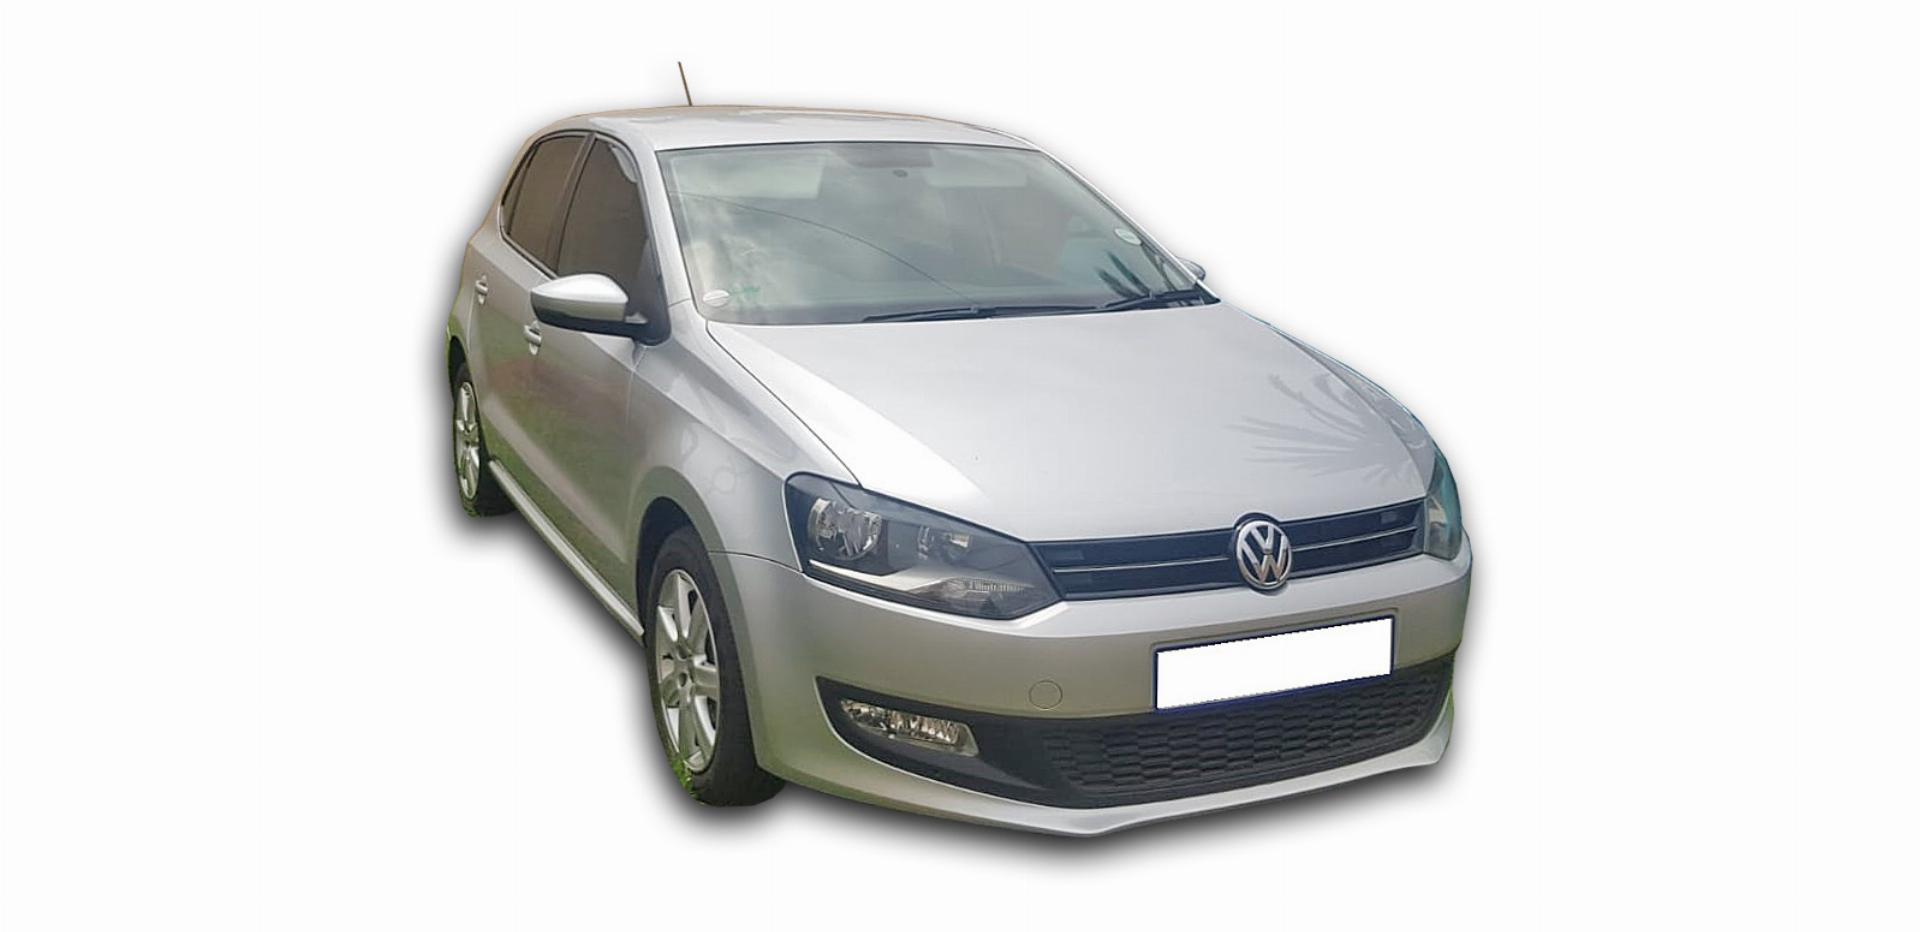 VW Polo 1.6 TDI Comfortline